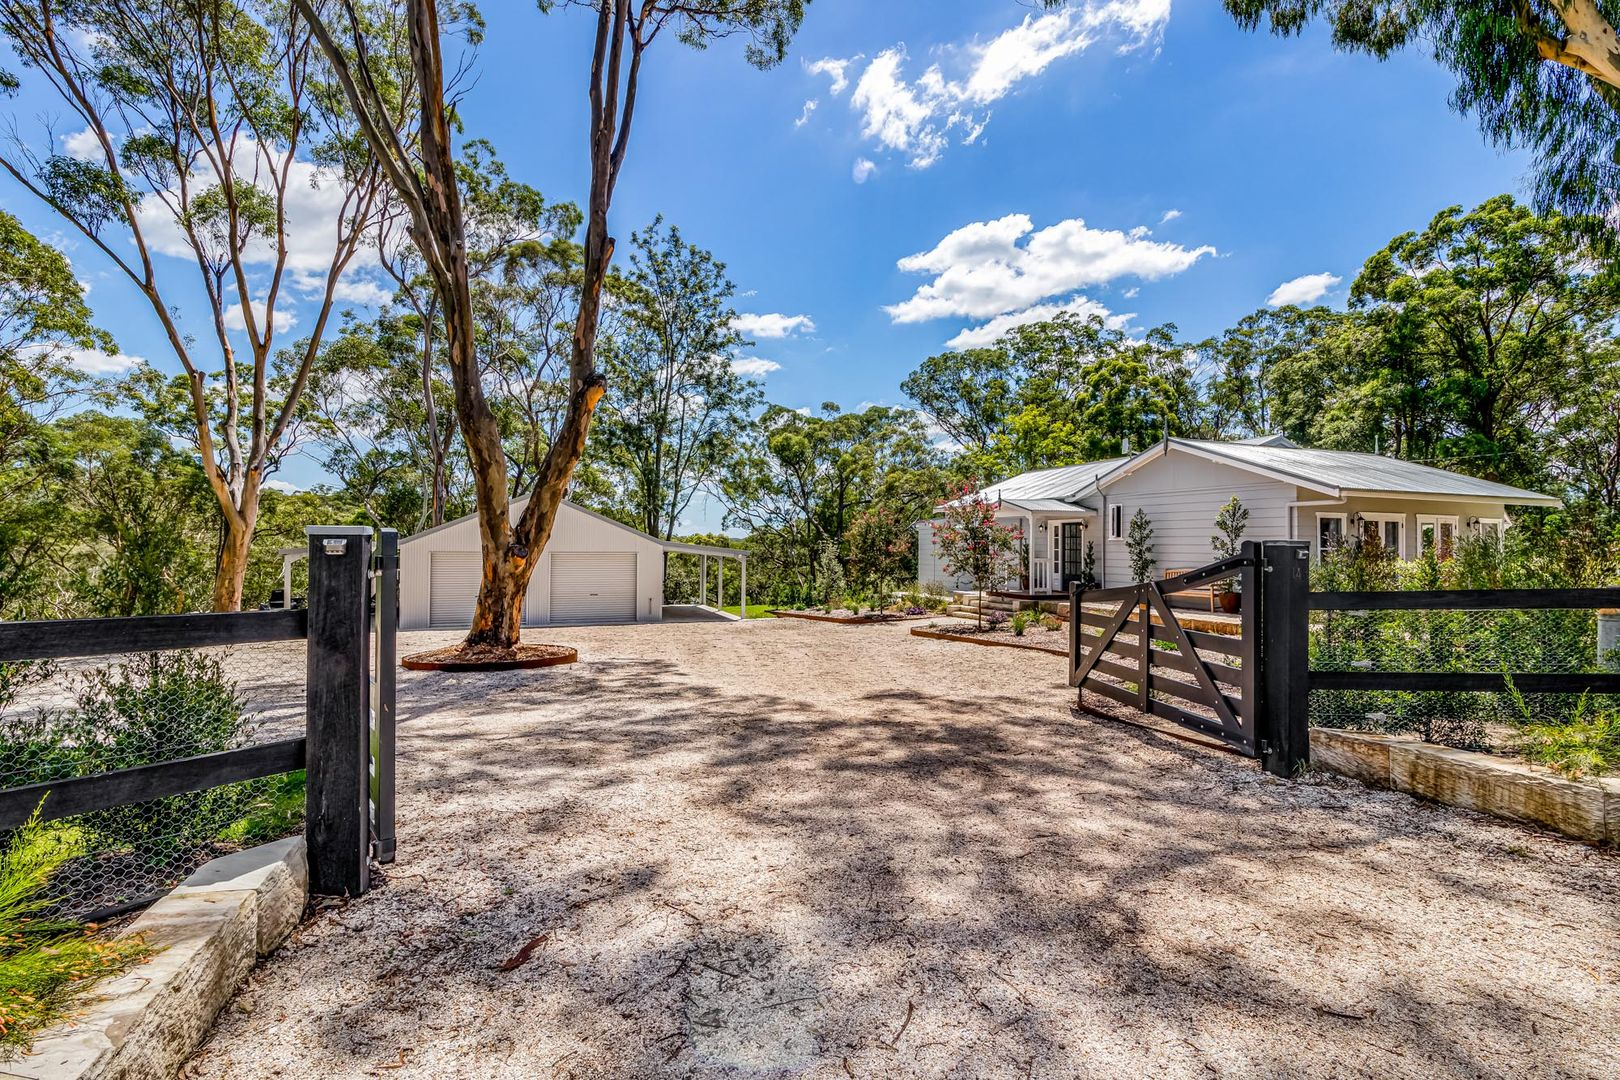 143 Arcadia  Road, Arcadia NSW 2159, Image 1